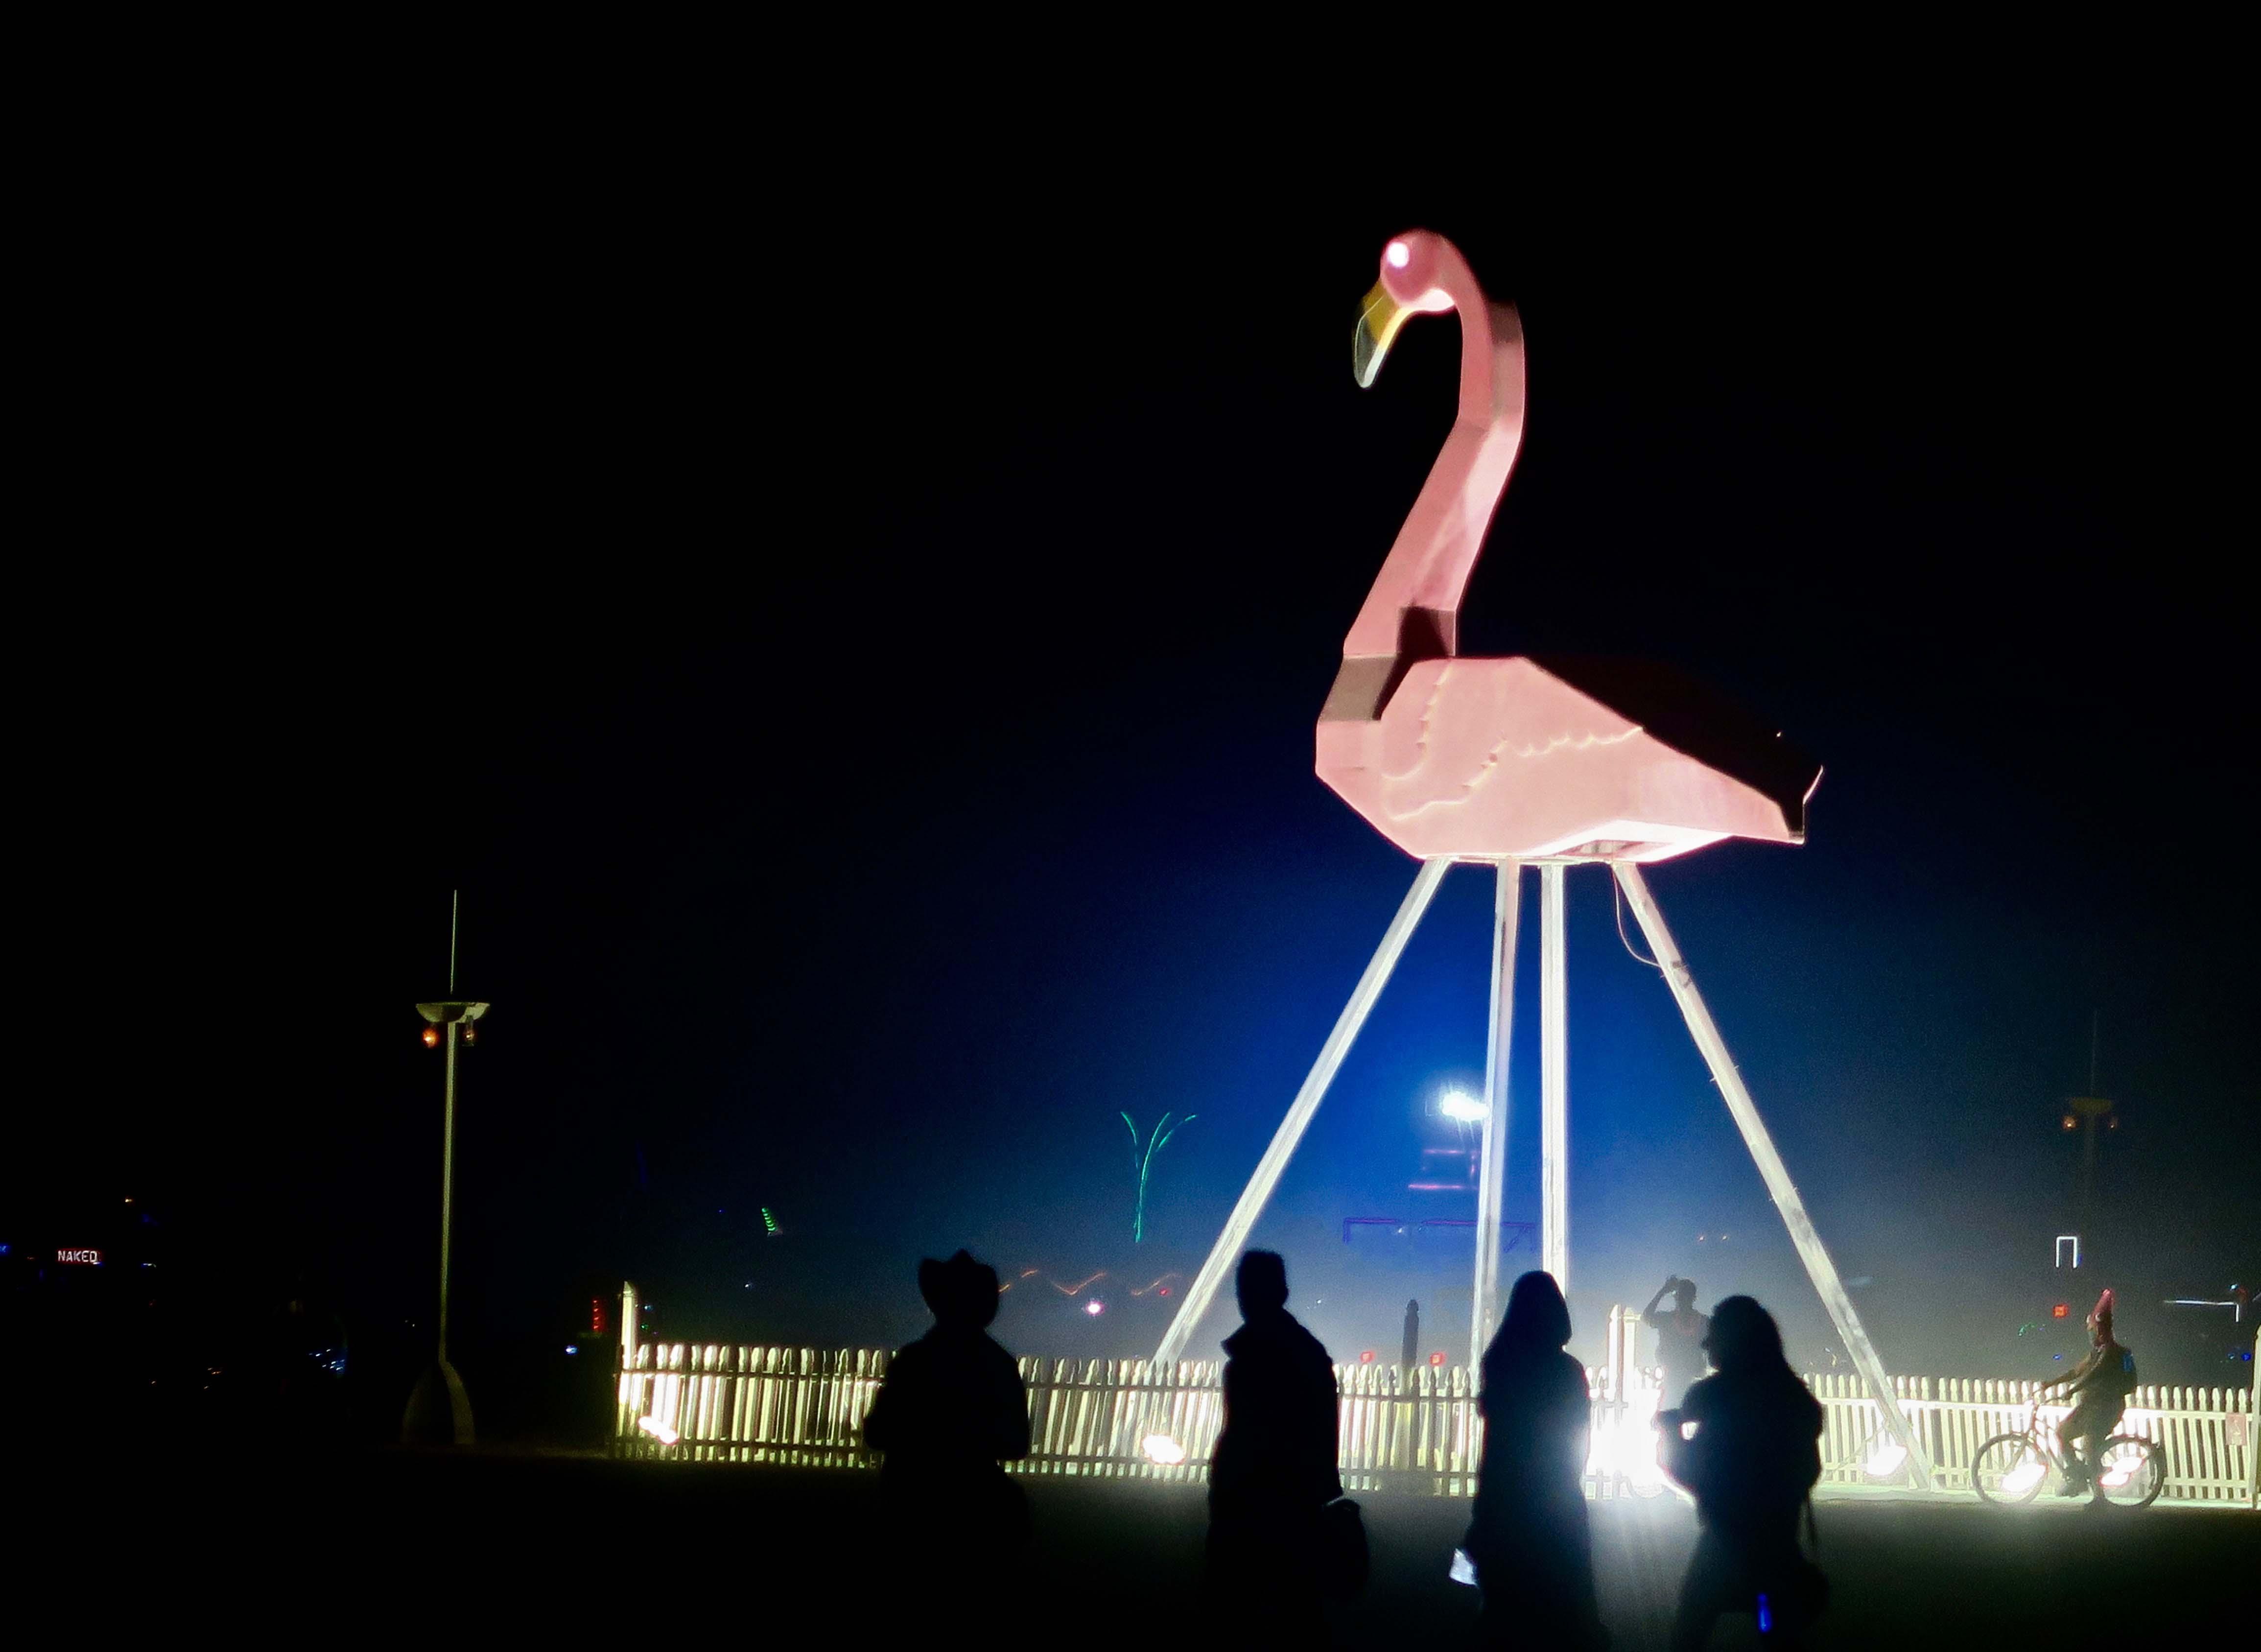 Nighttime giant flamingo at Burning Man 2017